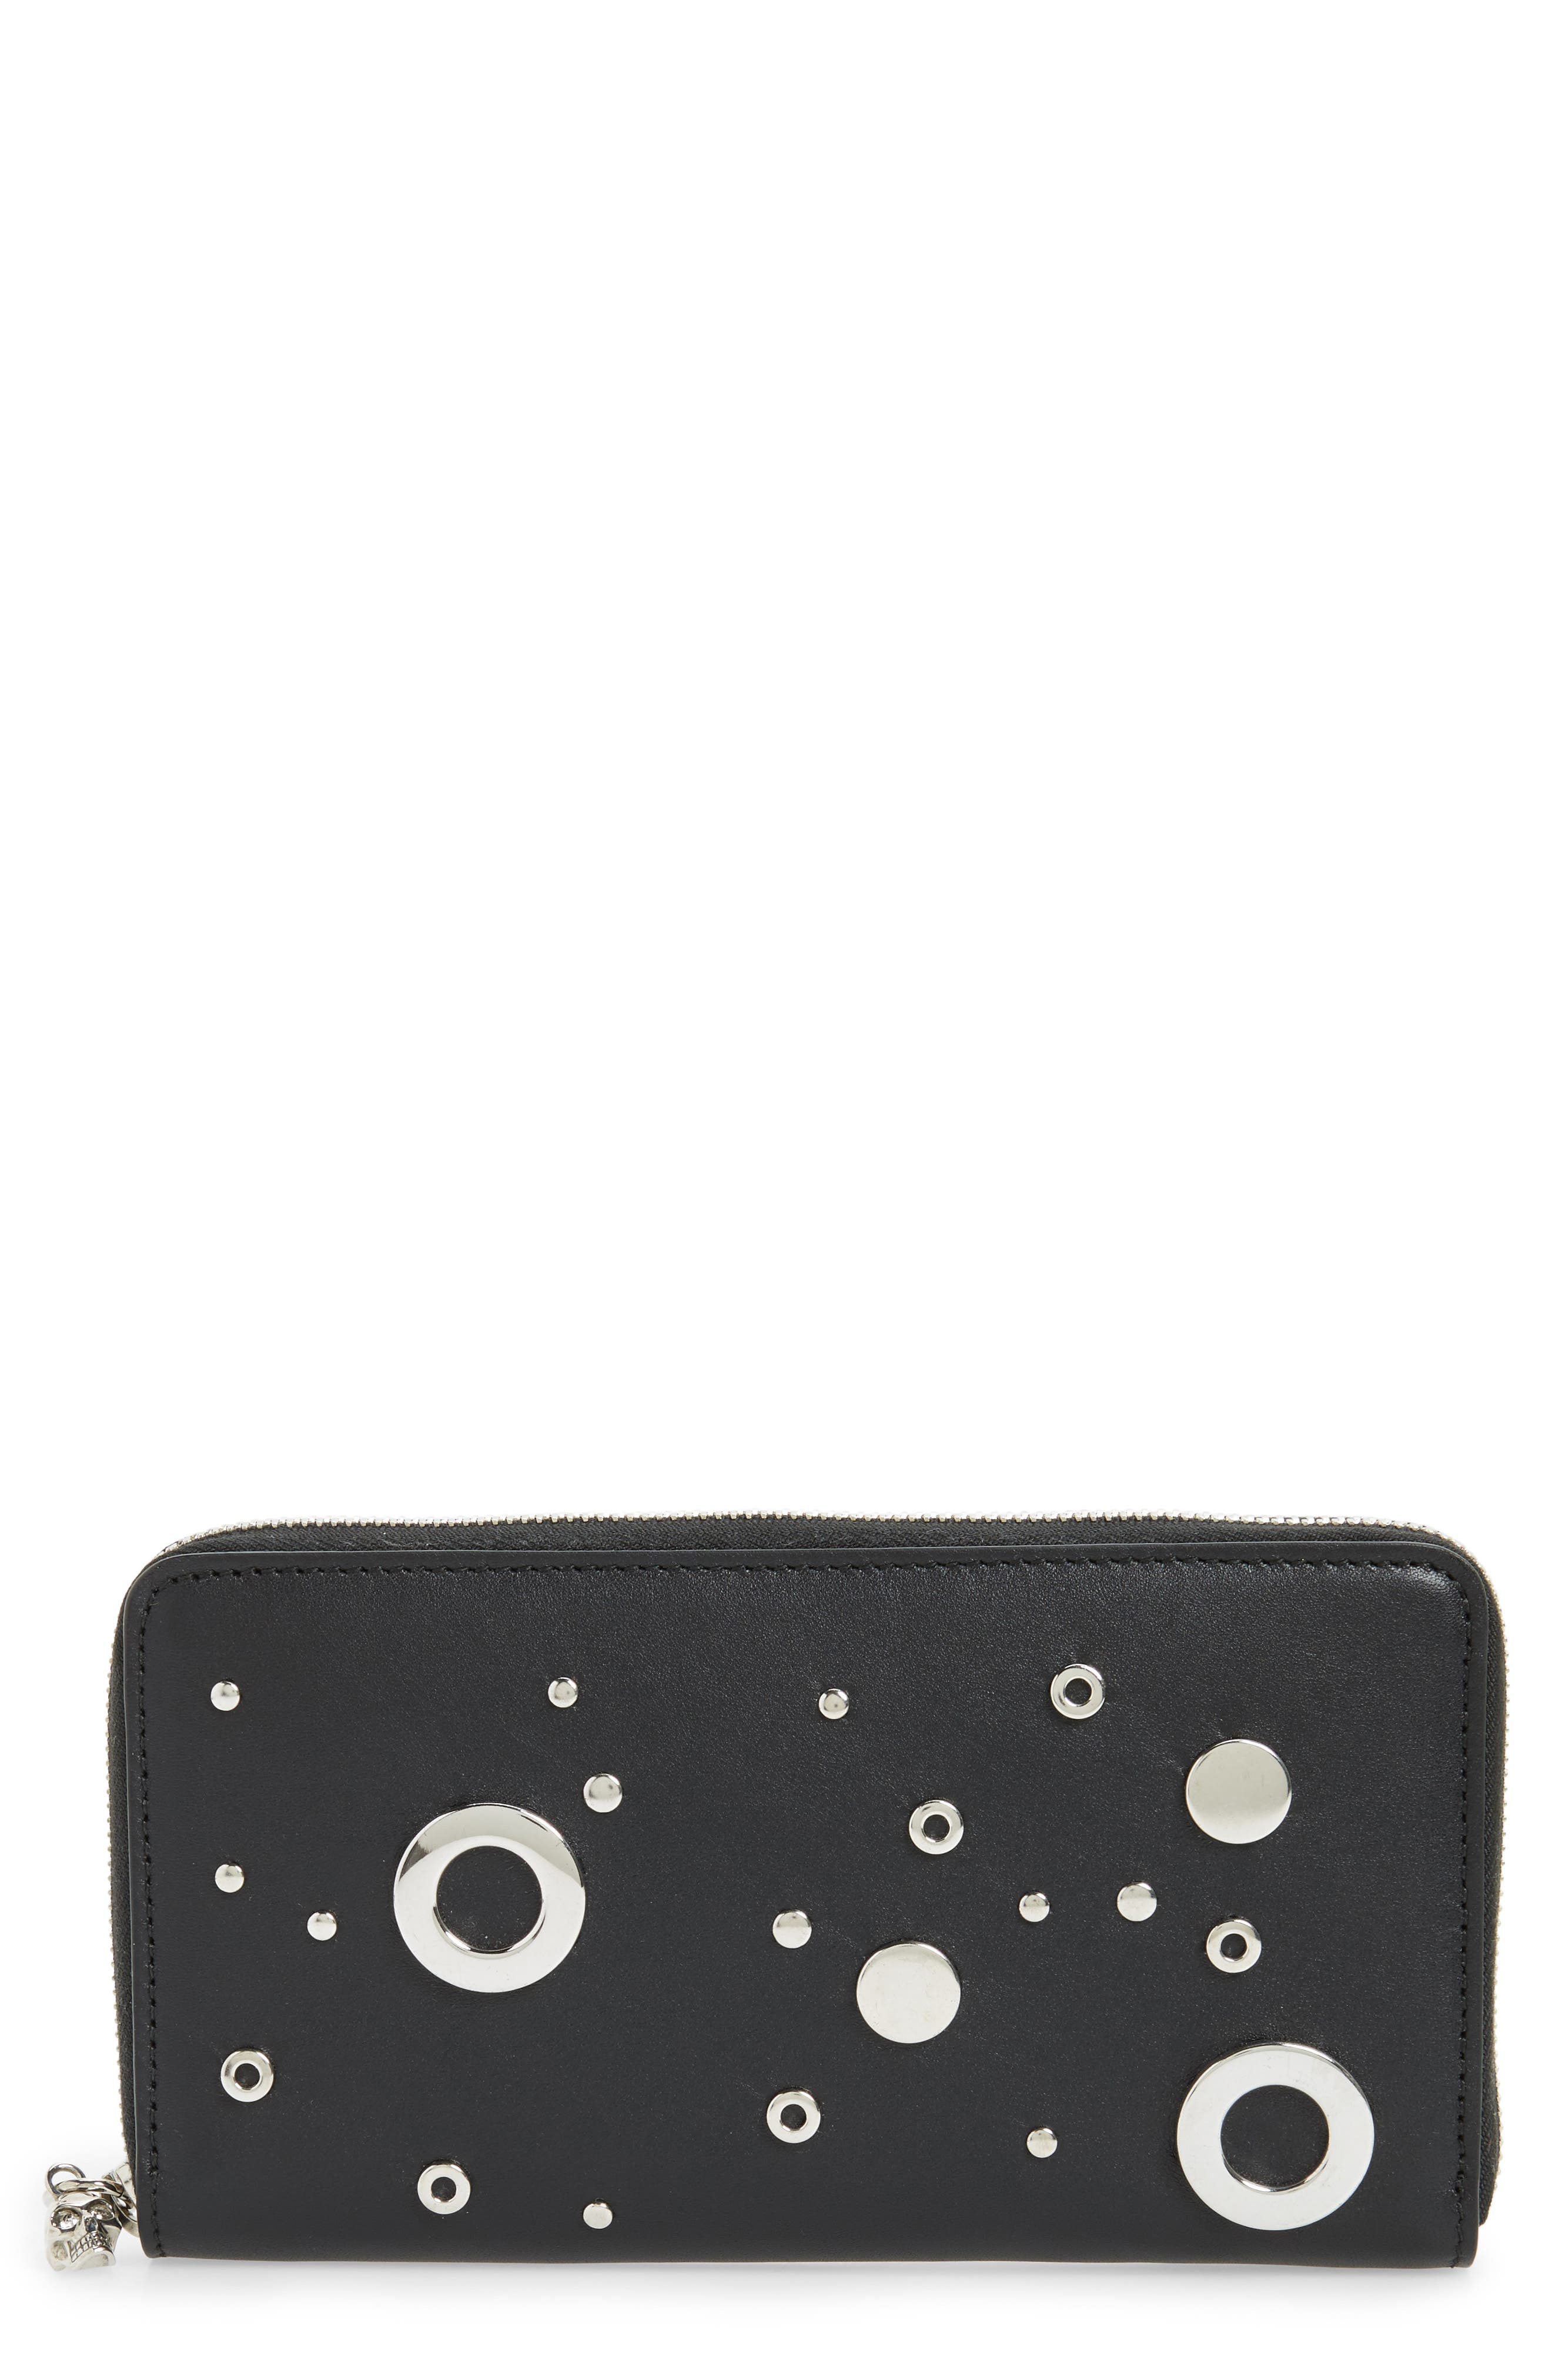 Grommet & Stud Calfskin Leather Continental Wallet,                         Main,                         color, Black